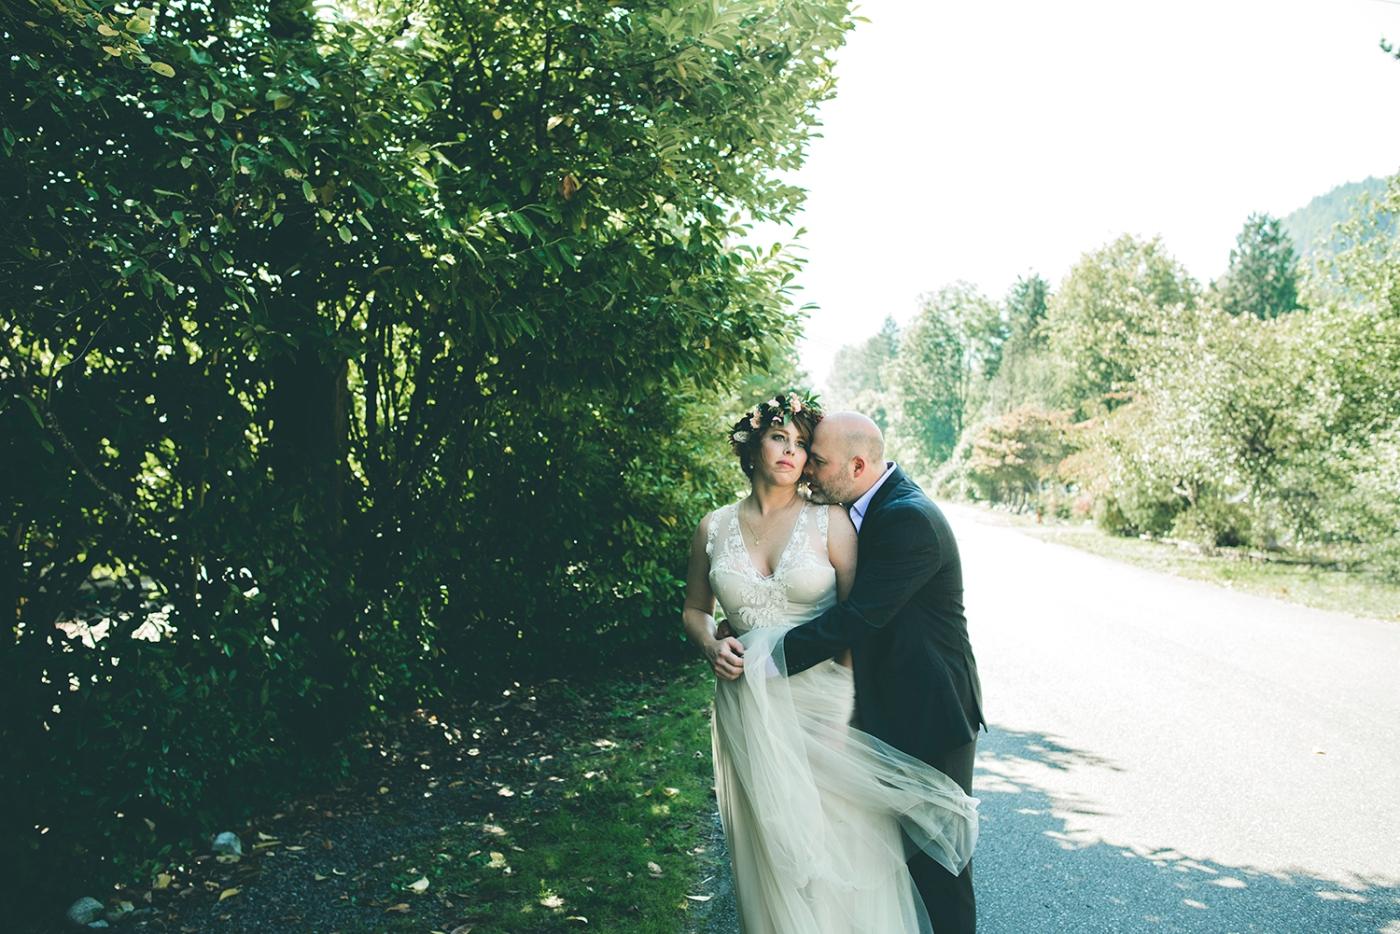 M&R River House Italian Wedding 2015DSC_4194